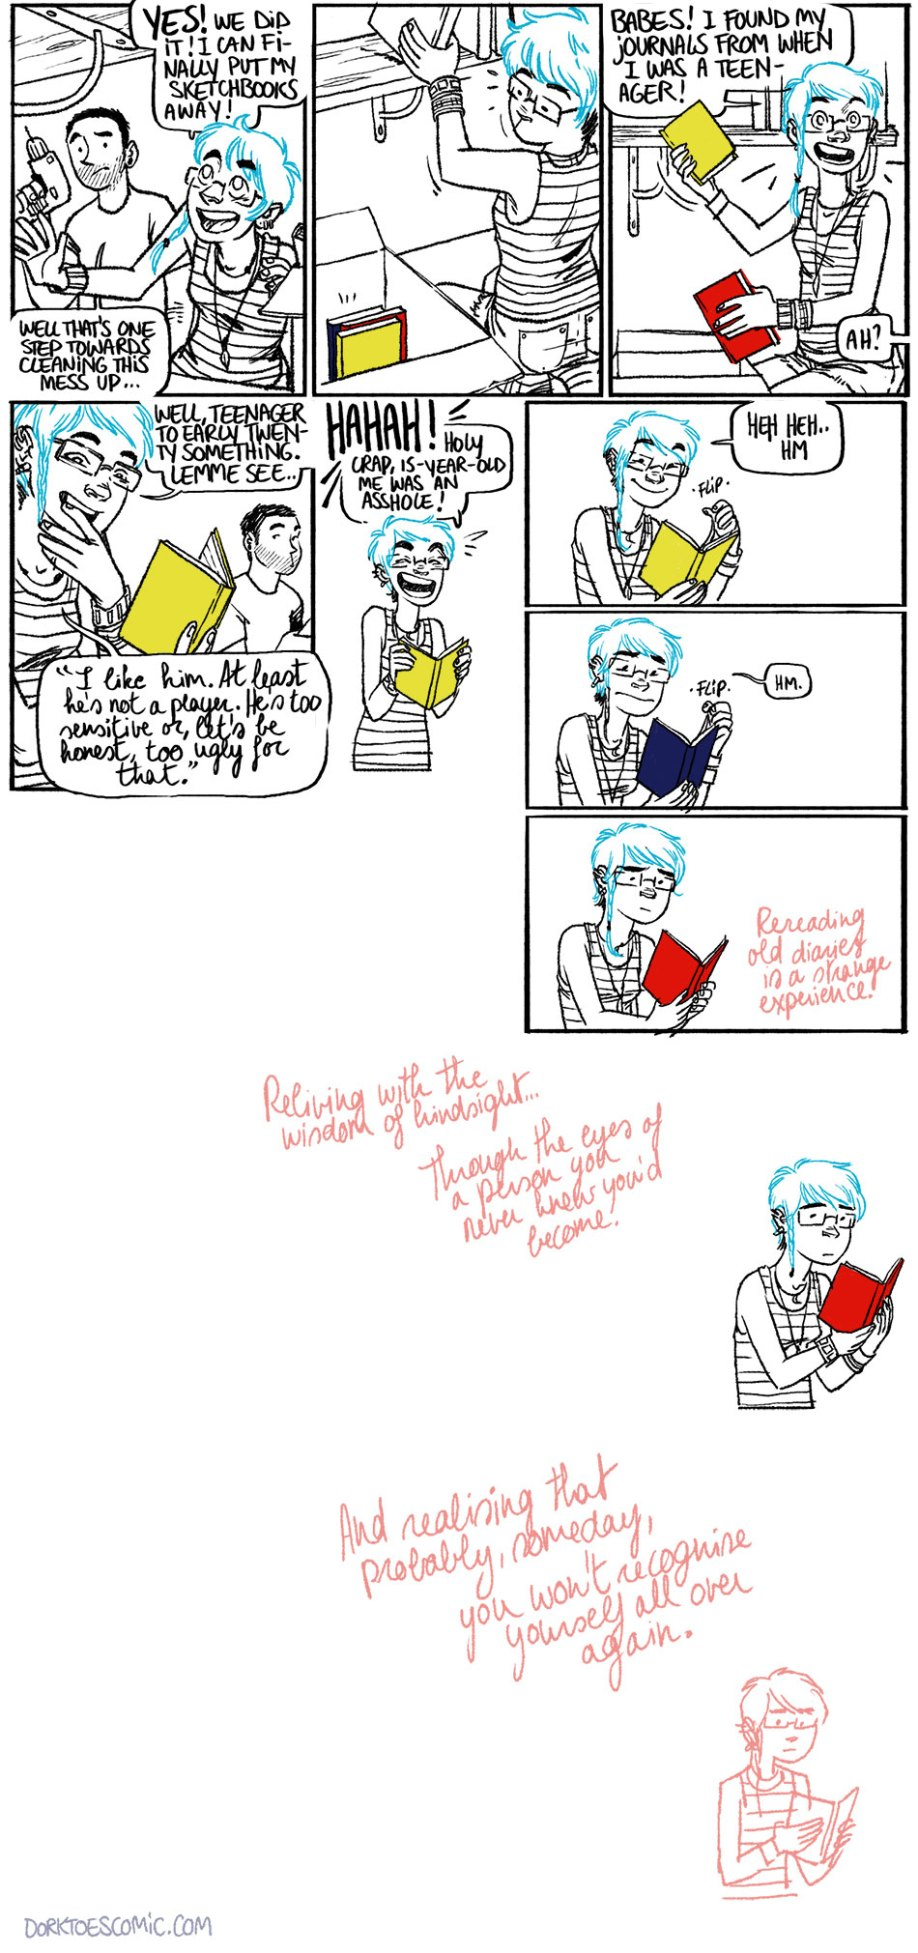 OldJournals